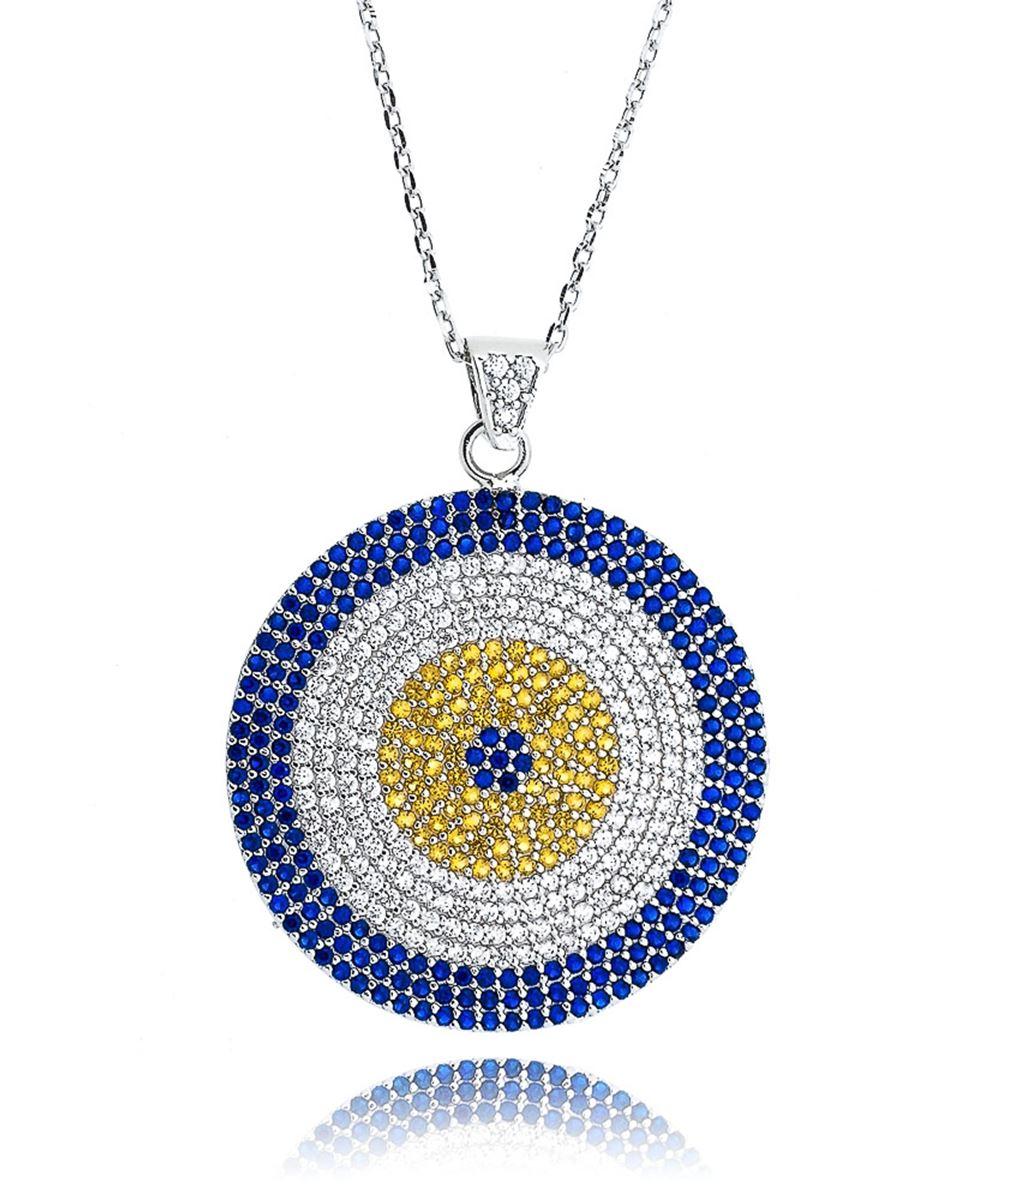 colar olho grego grande colorido prata turca